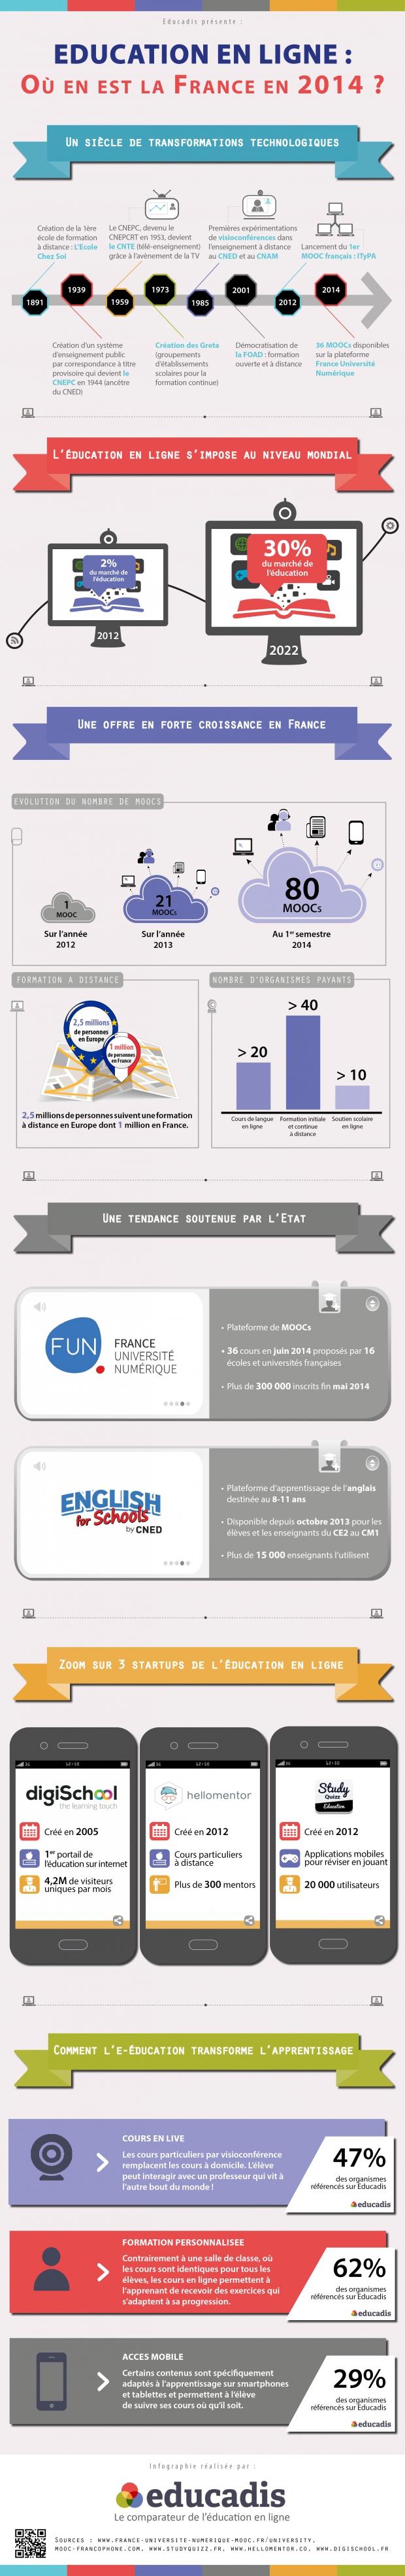 Infographie educadis juillet 2014